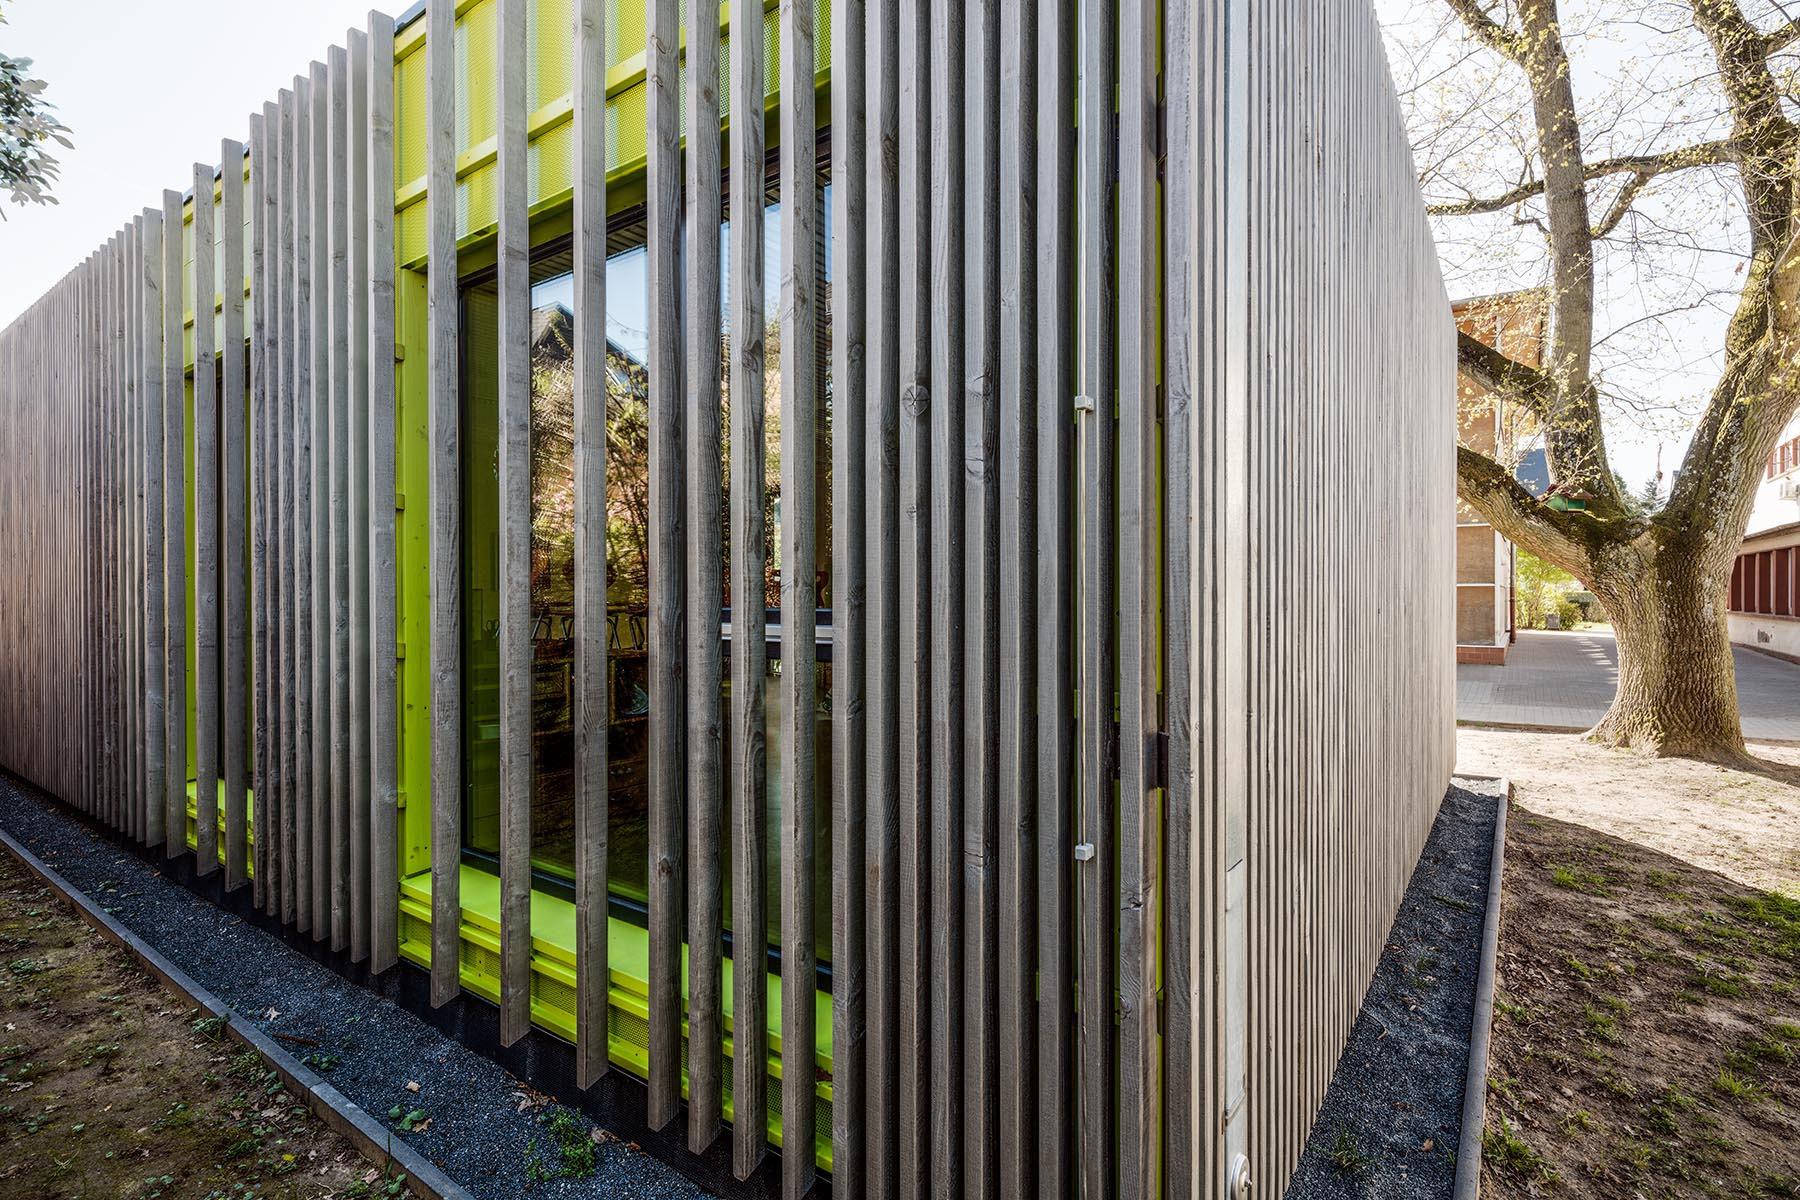 Holzfassade an Schulgebäude in modernem Stil